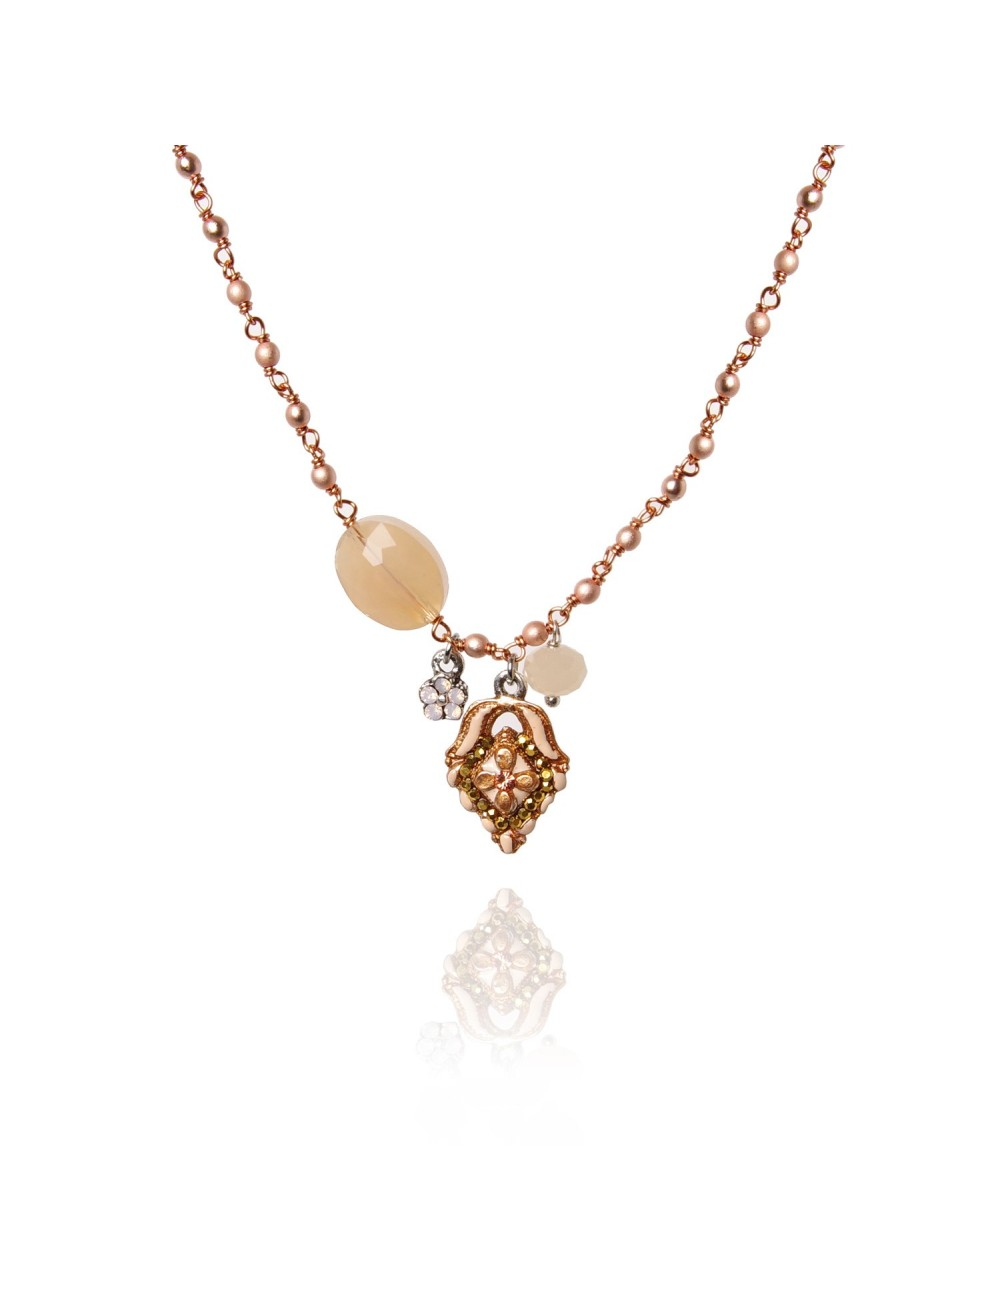 Collier perlé Yendy